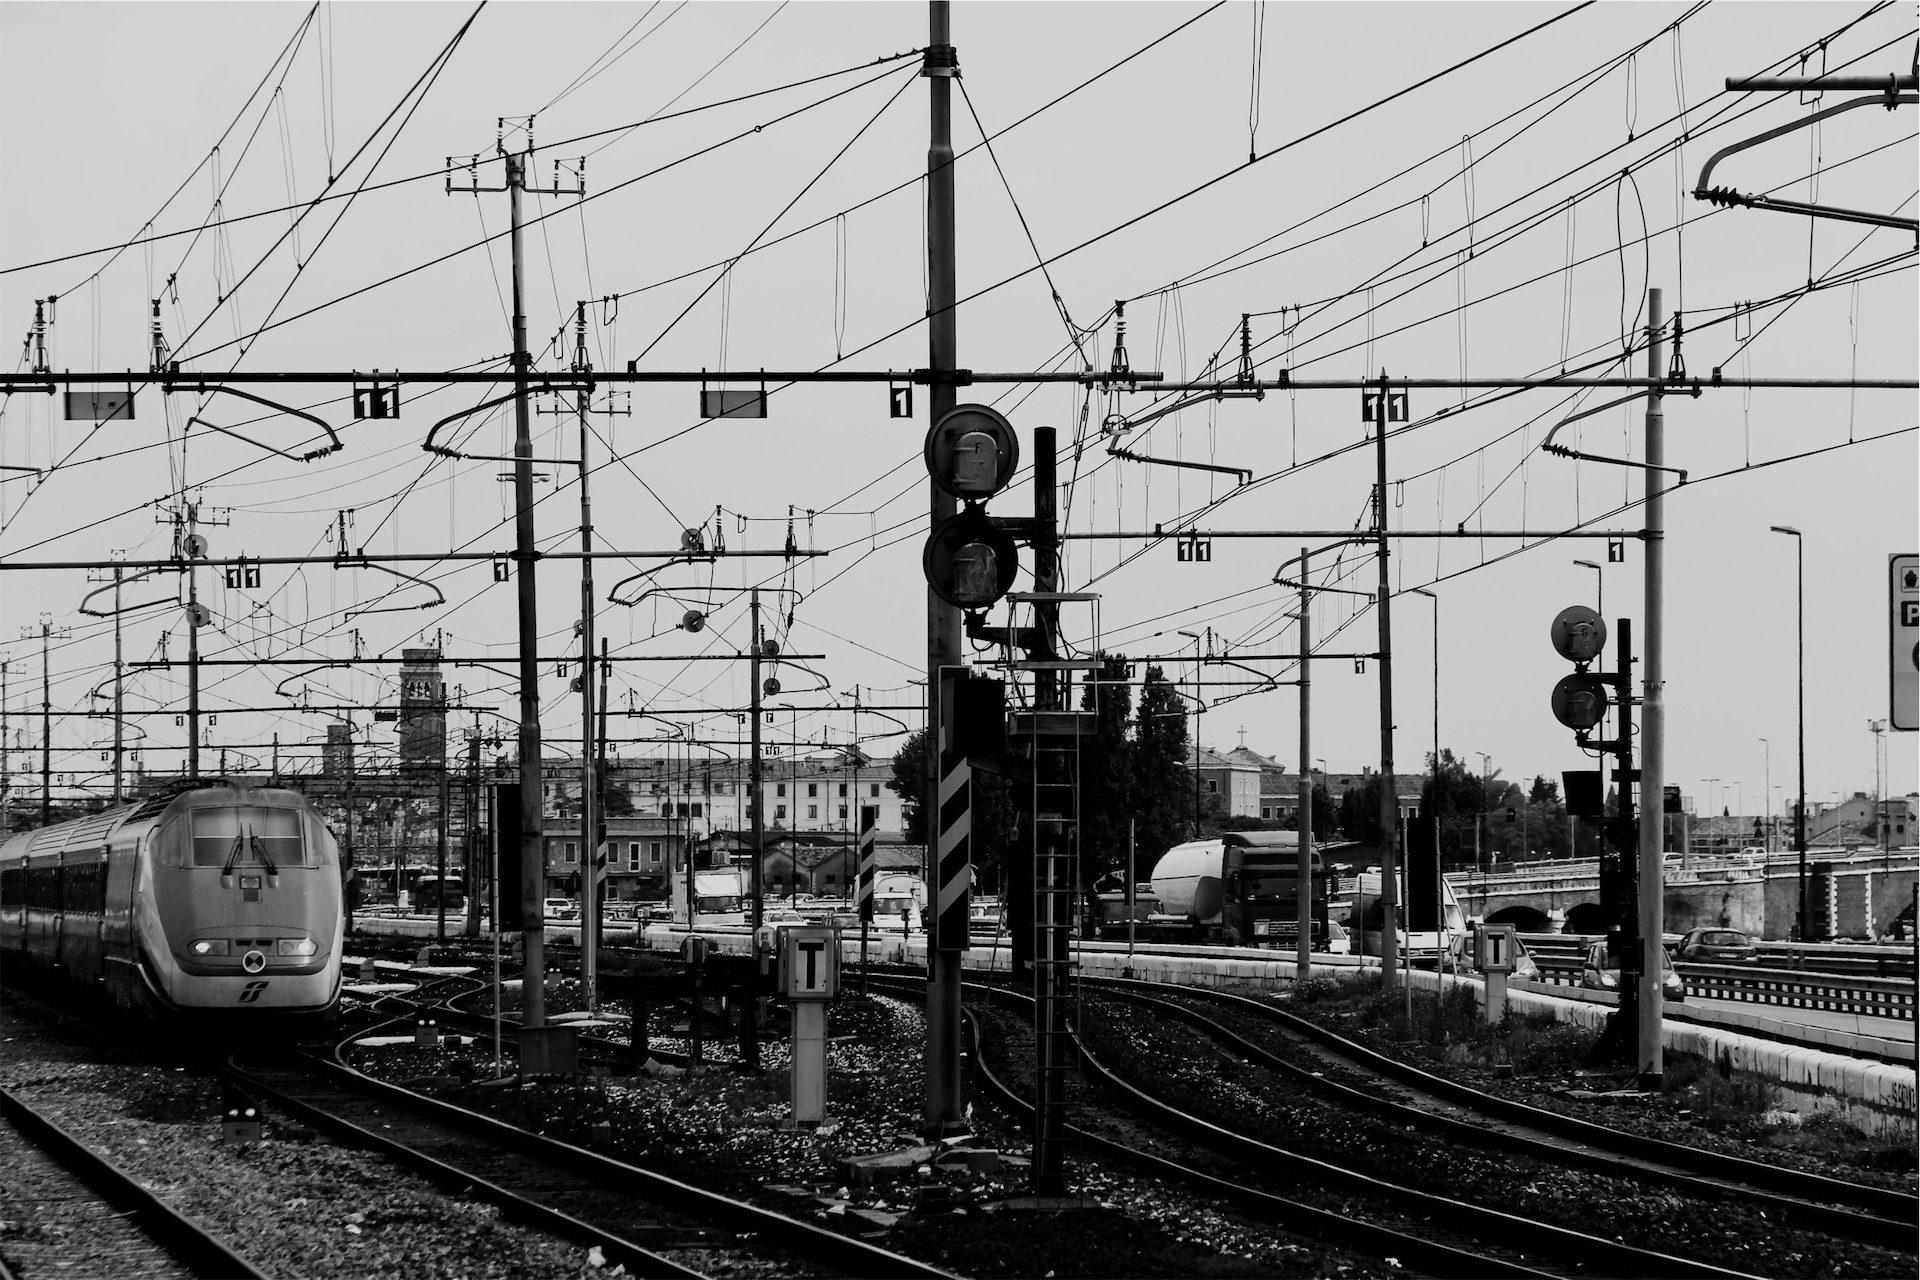 ट्रेन, रेलवे, रास्ते, catenaries, बिजली - HD वॉलपेपर - प्रोफेसर-falken.com